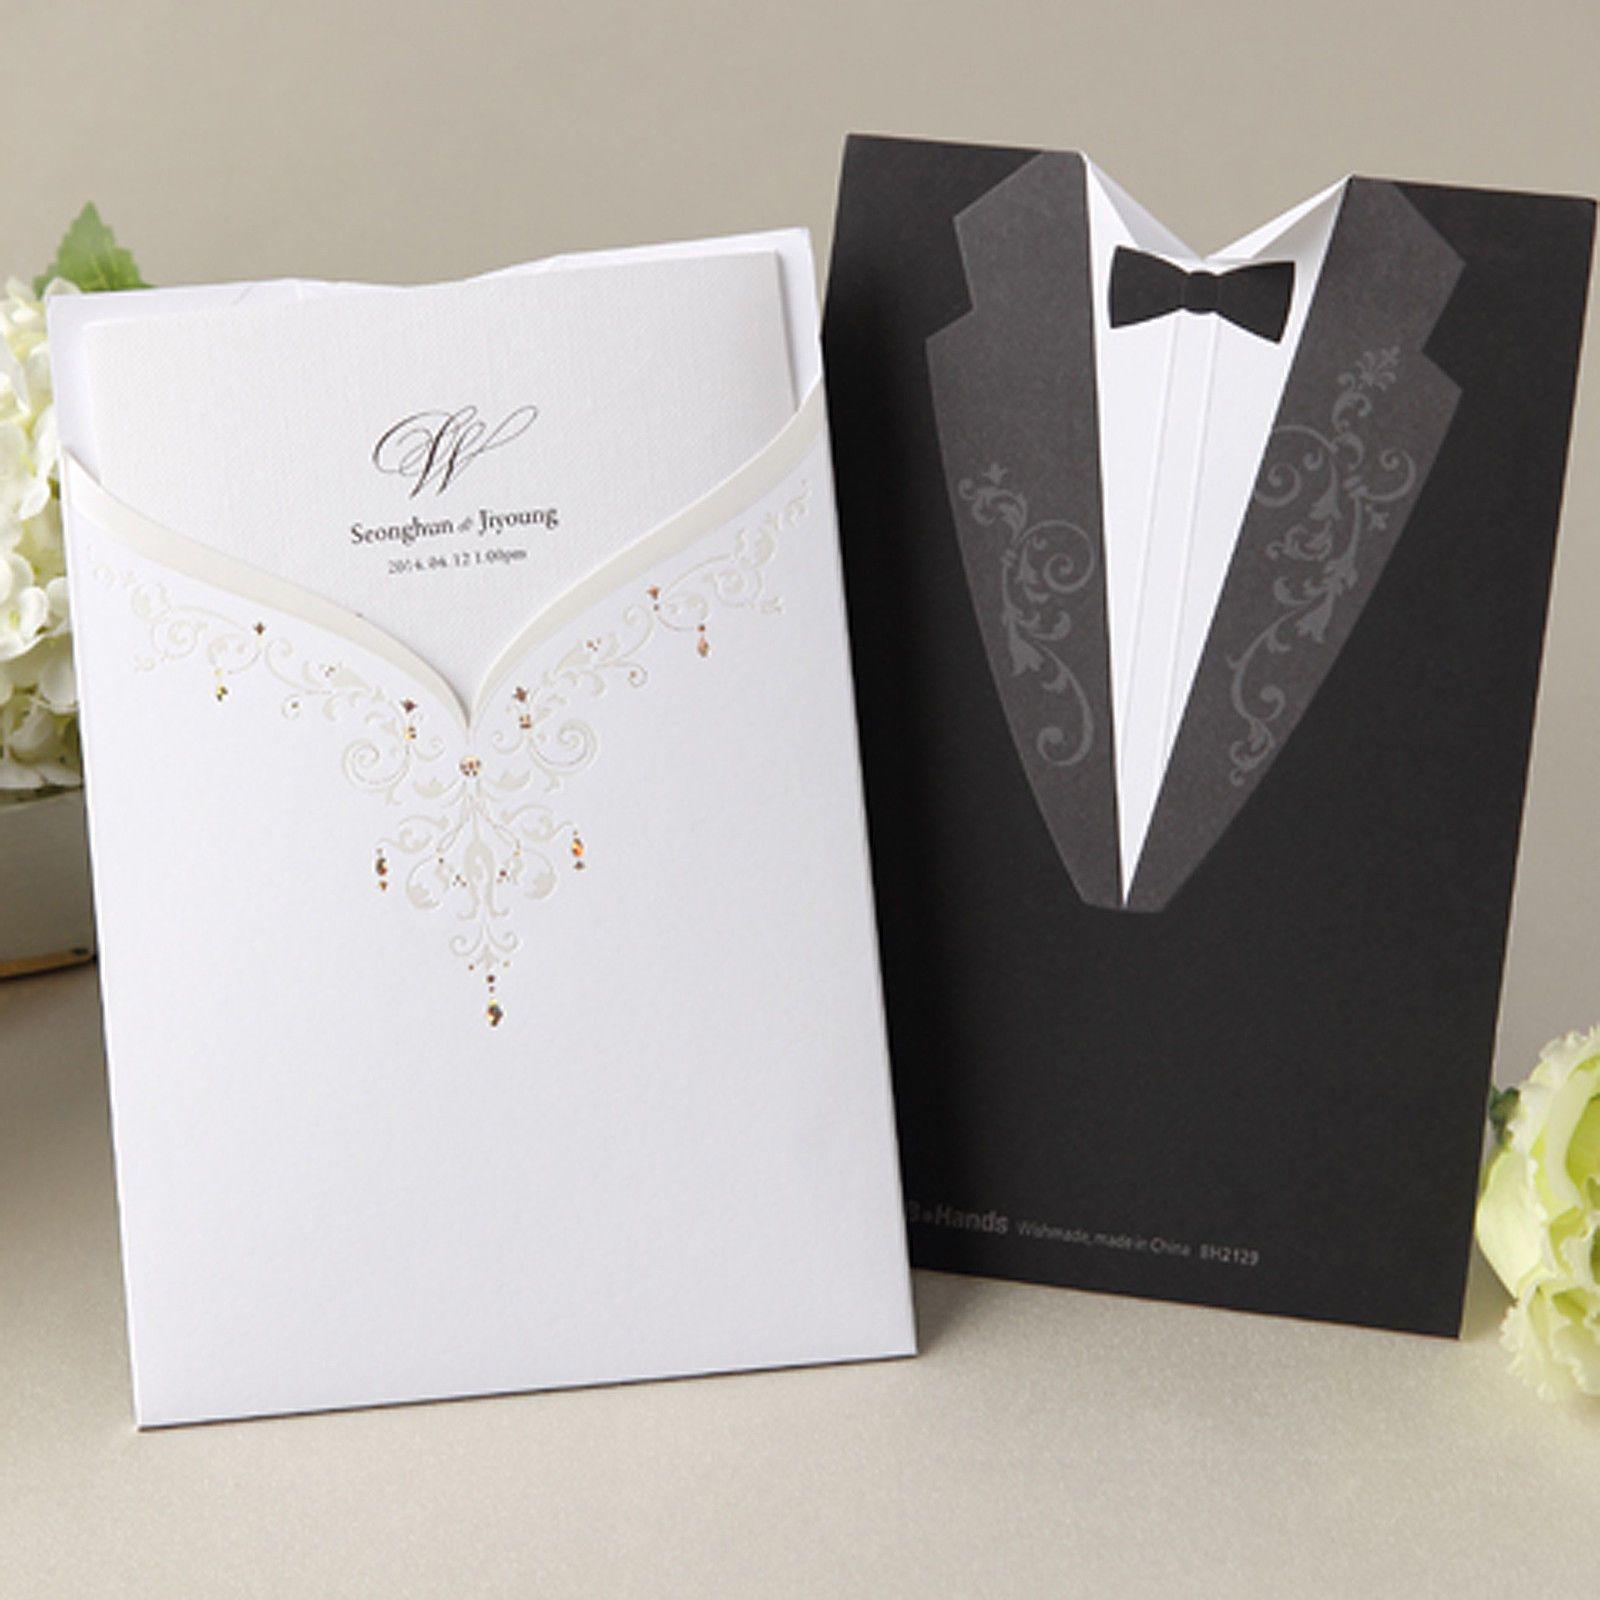 sample spanish wedding invitations%0A B Hands Card   Sample Set Wedding Luxury Invitation Dress Tuxedo Tie BH       blackandwhite